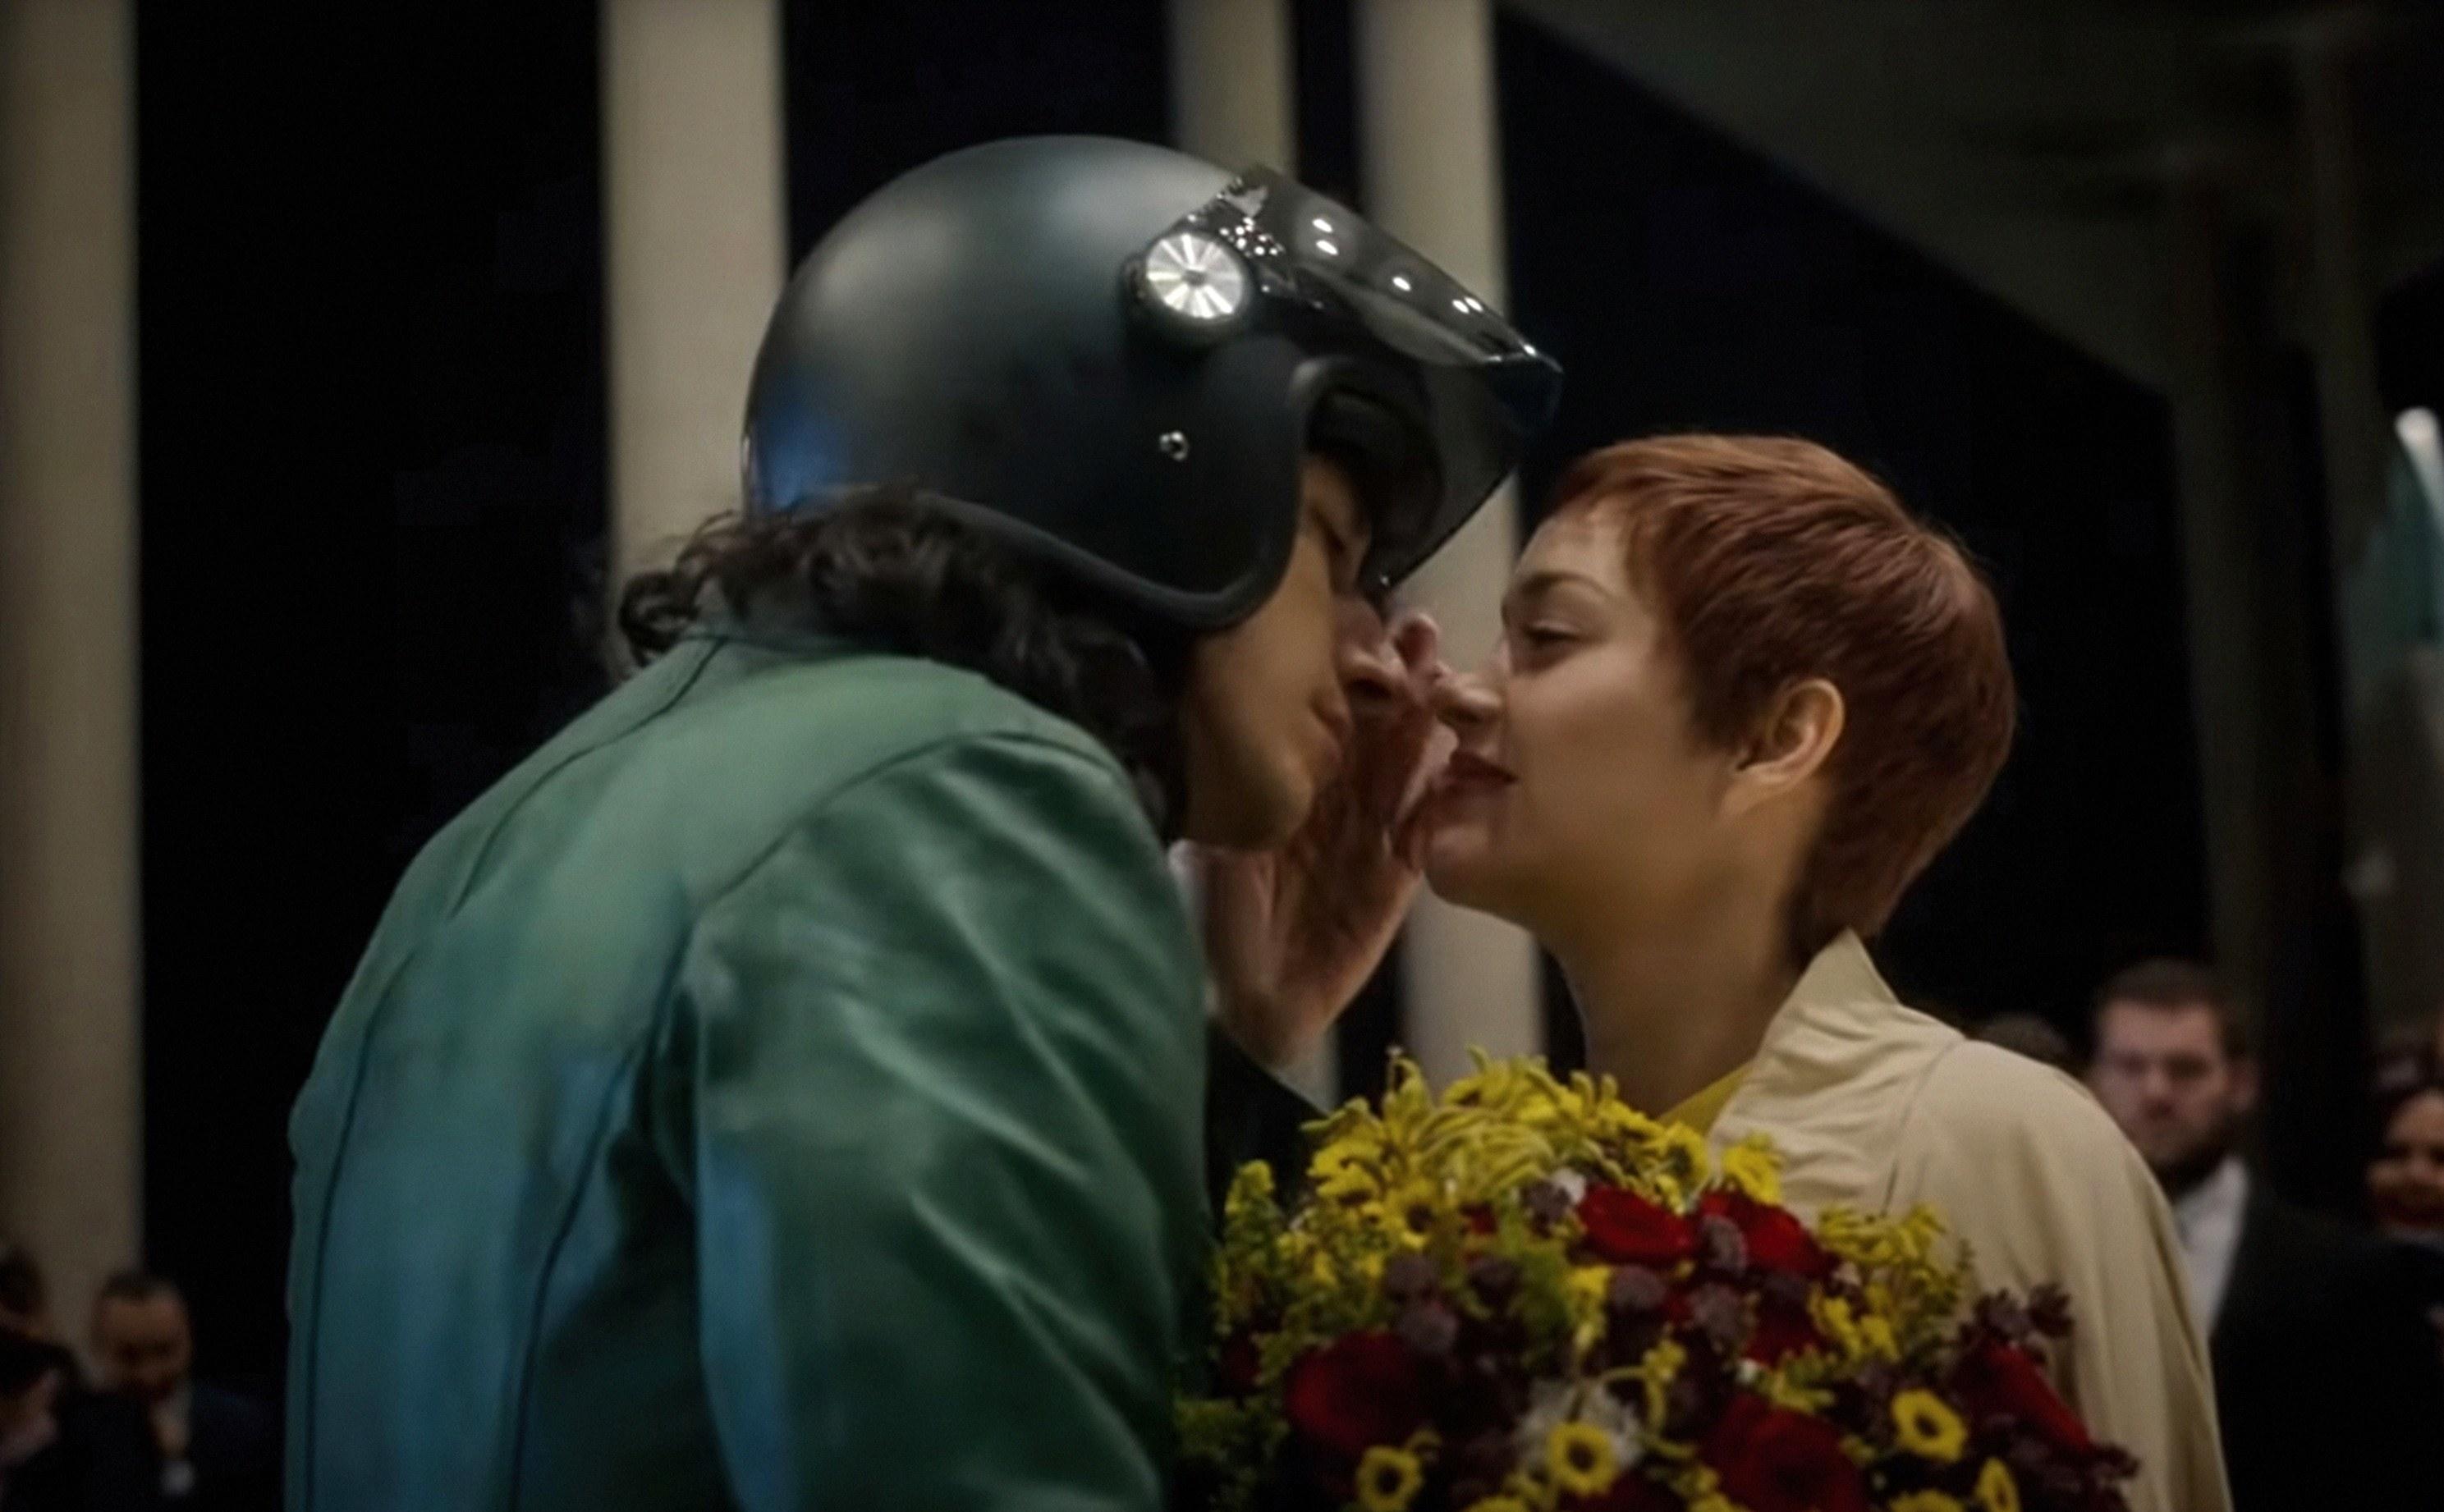 Marion Cotillard holding flower prepares to kiss Adam Driver in a motorcycle helmet